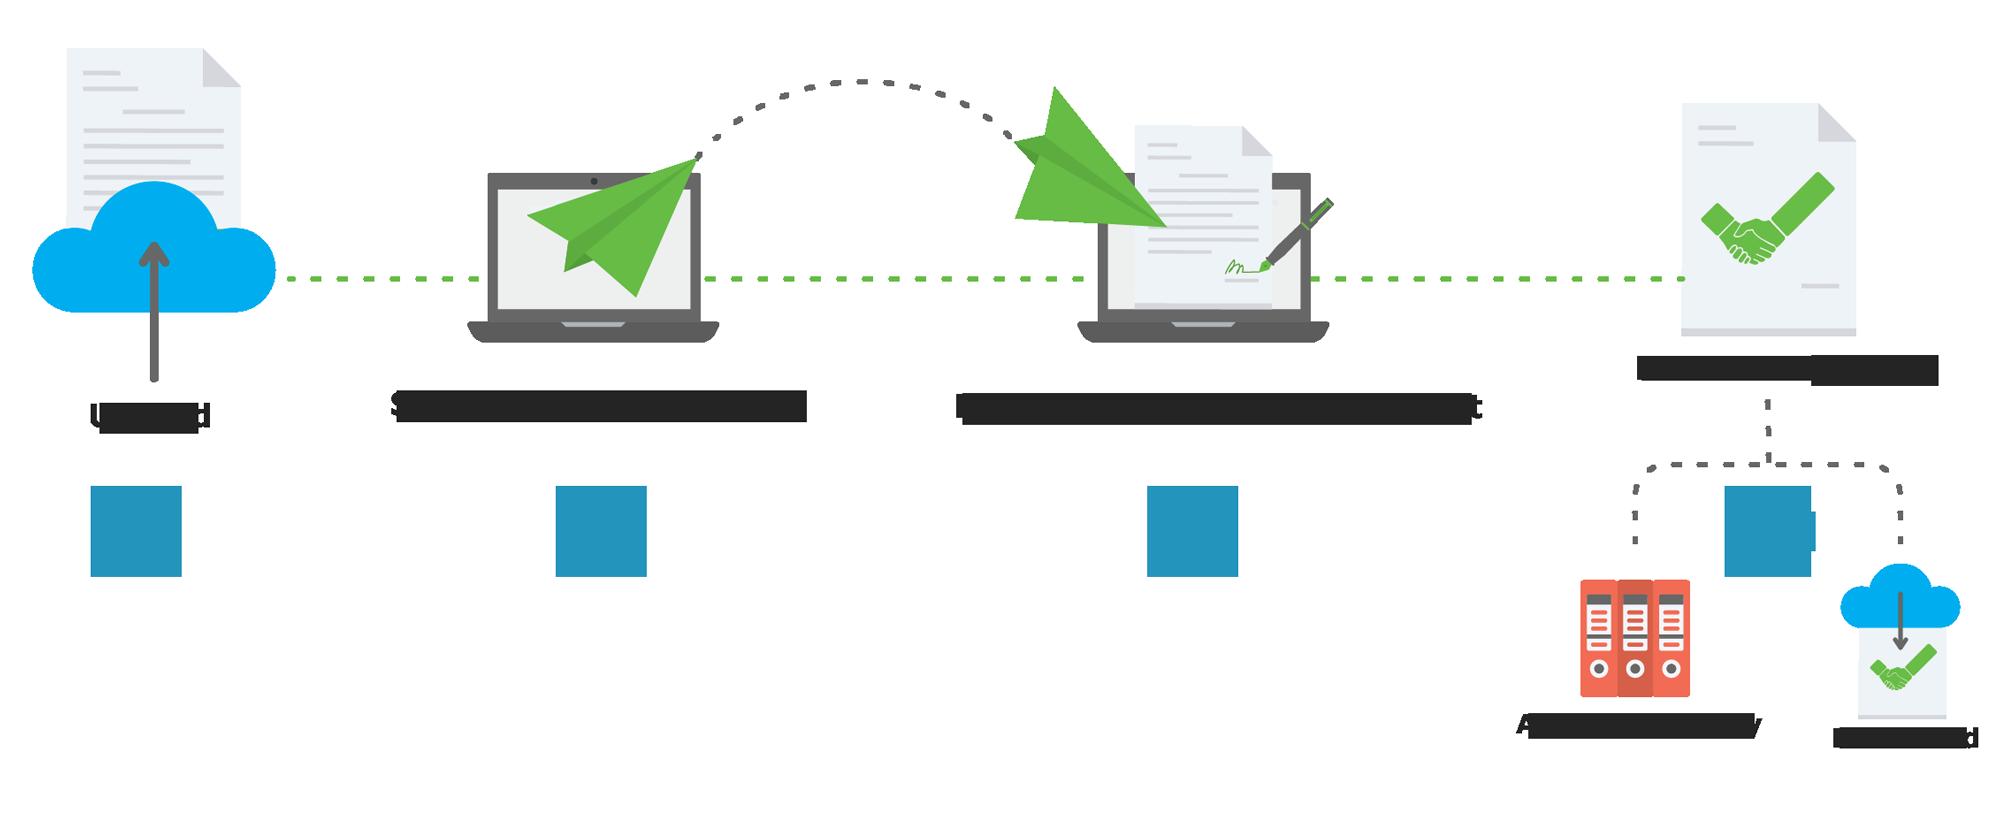 TruePact Service Process